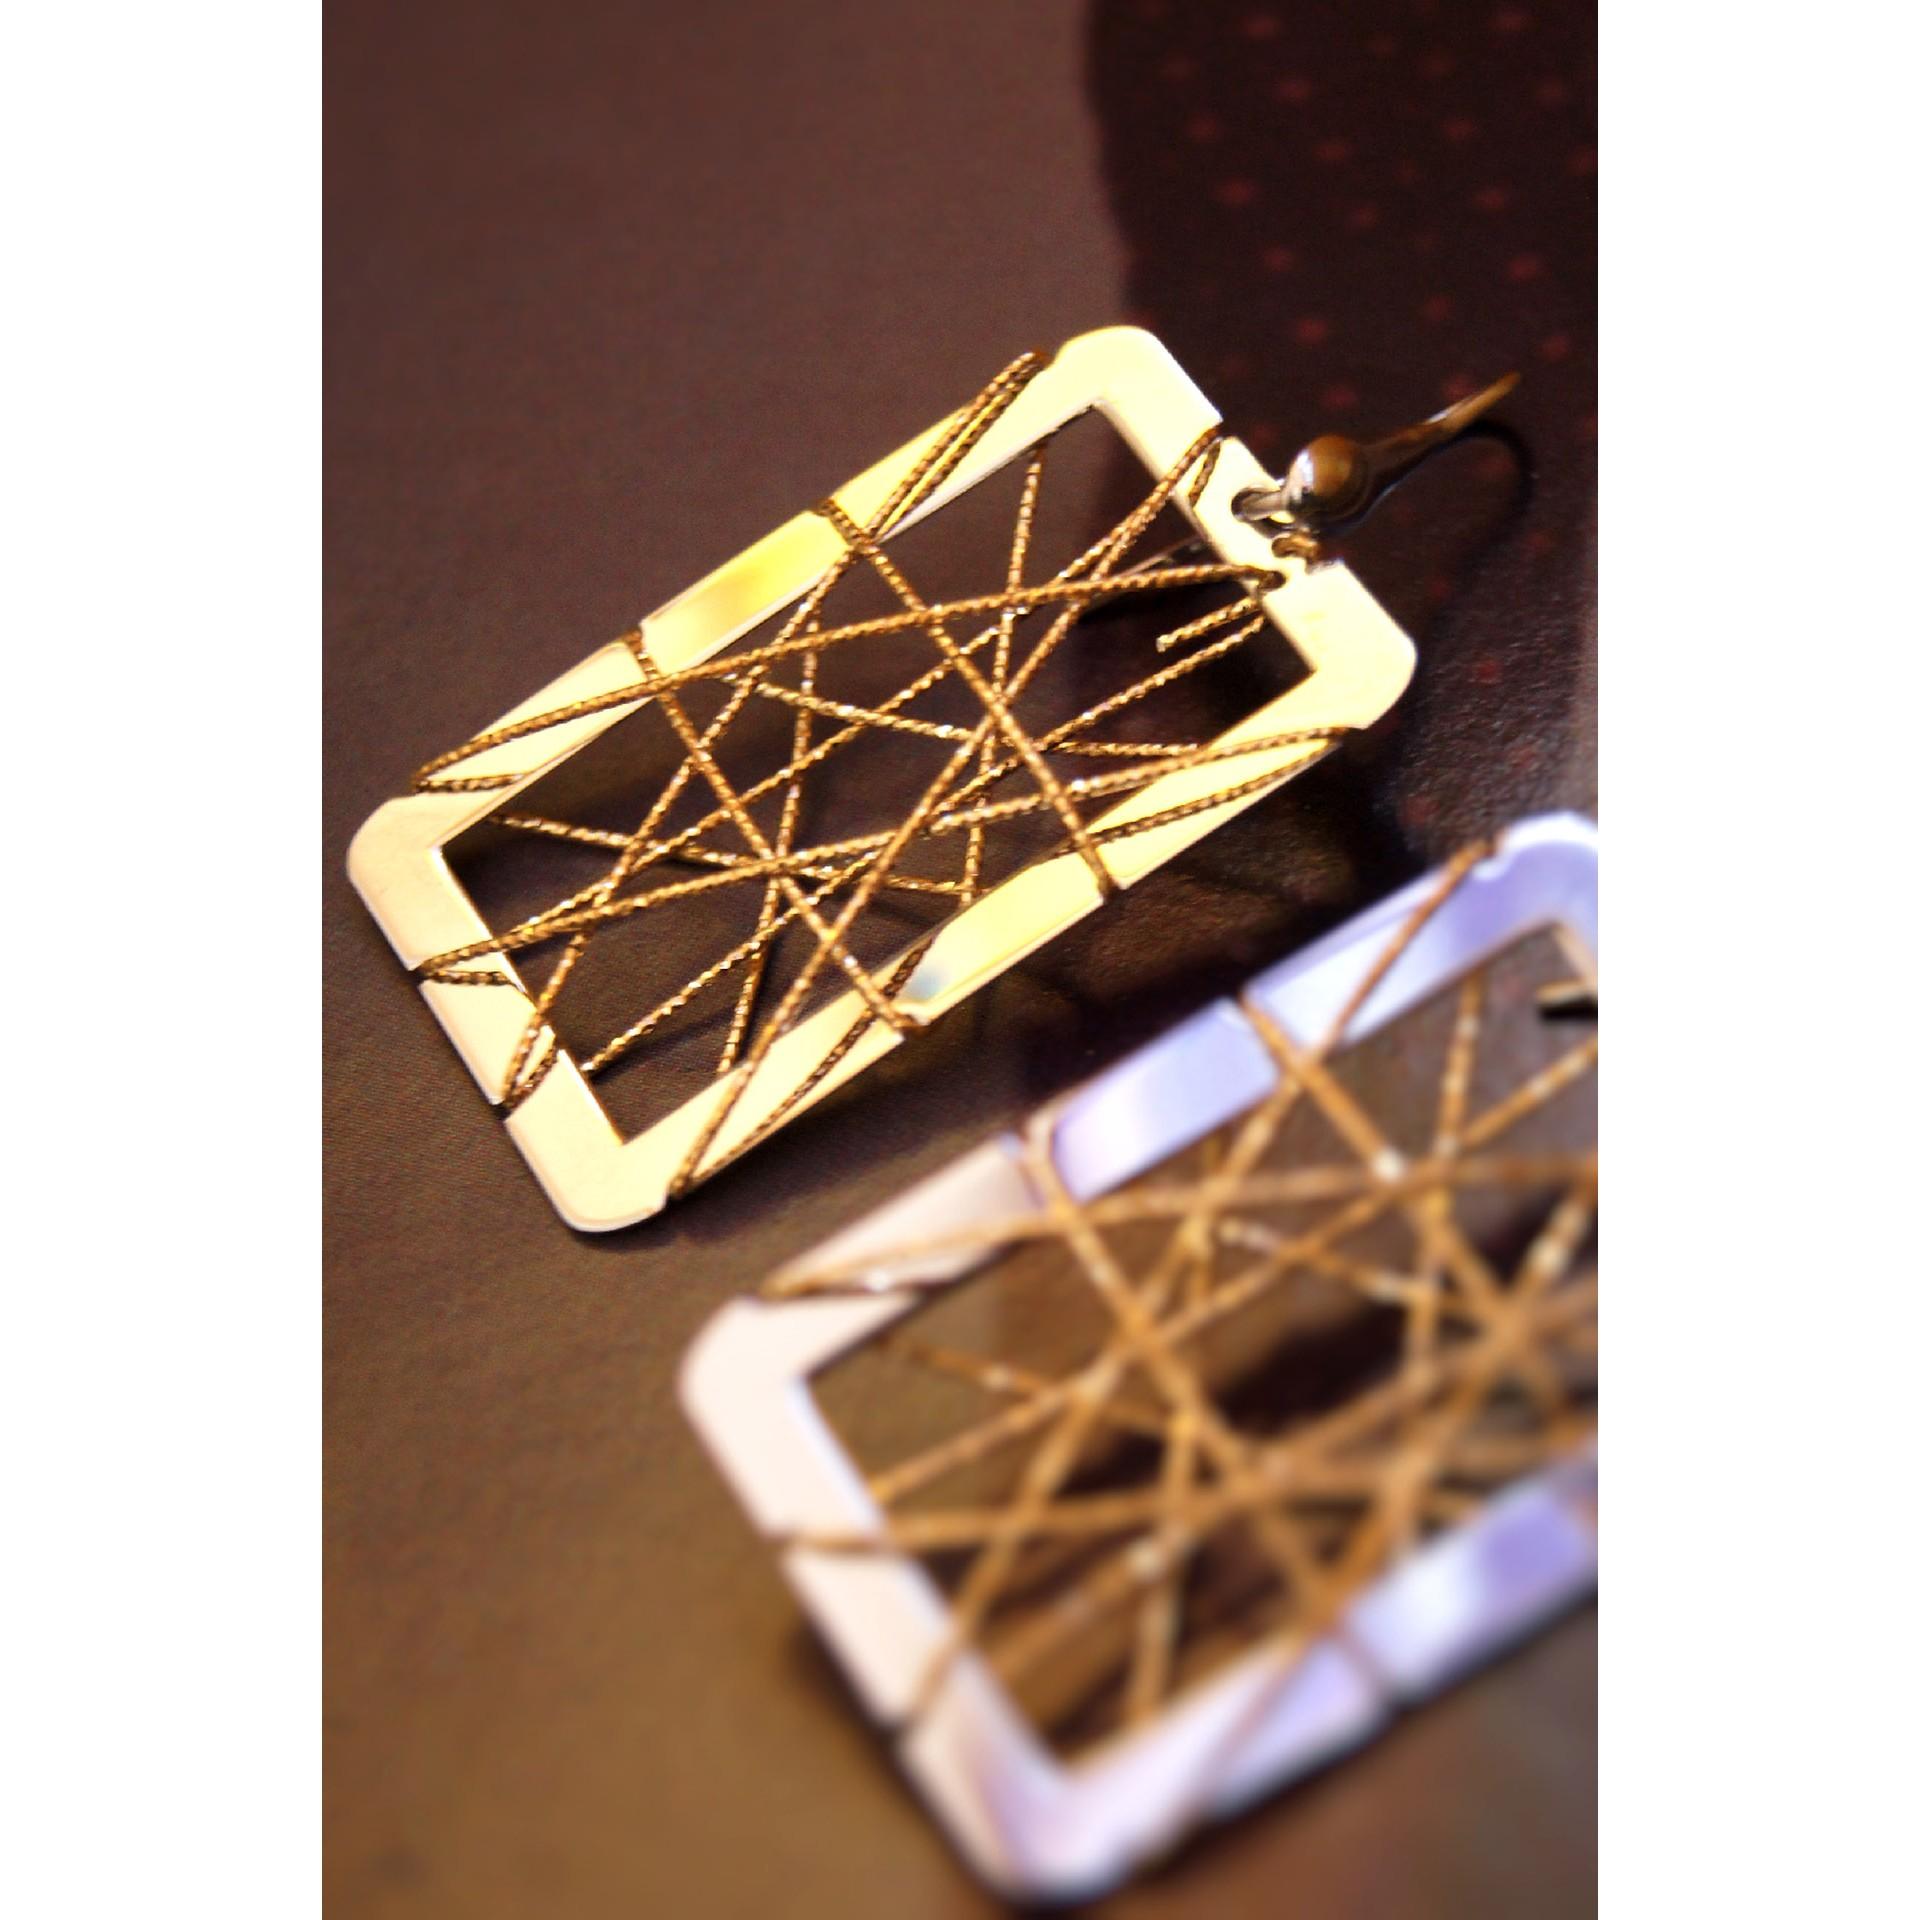 The Aria silver earrings